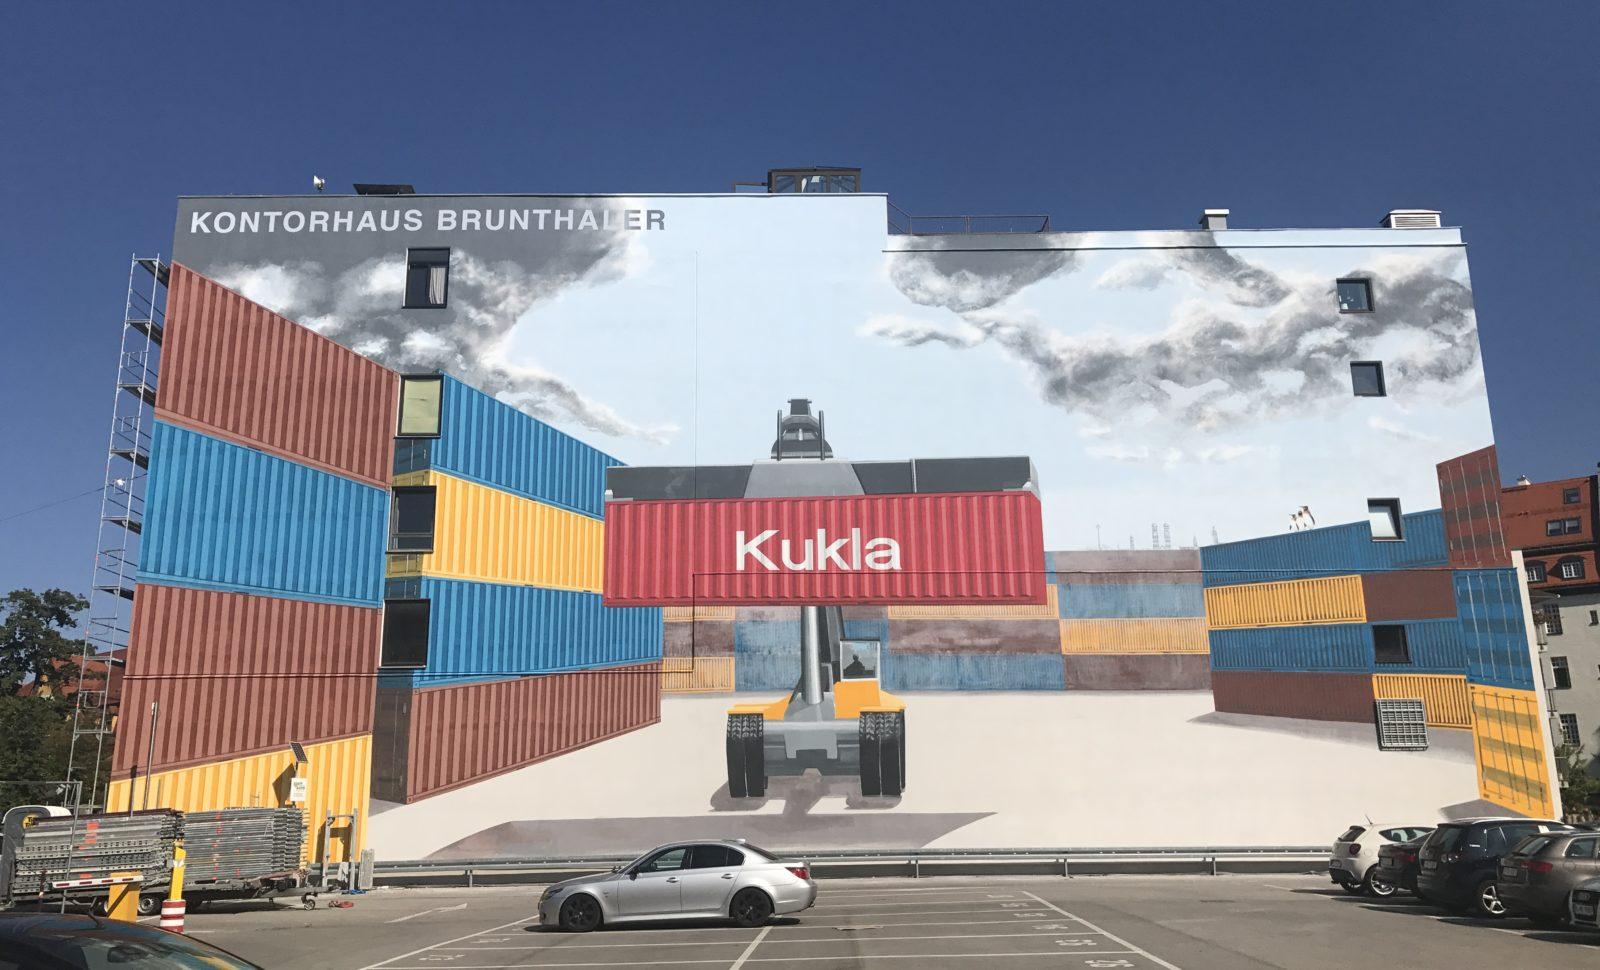 Logistikdienstleister: Kukla macht Logistik zur Kunst